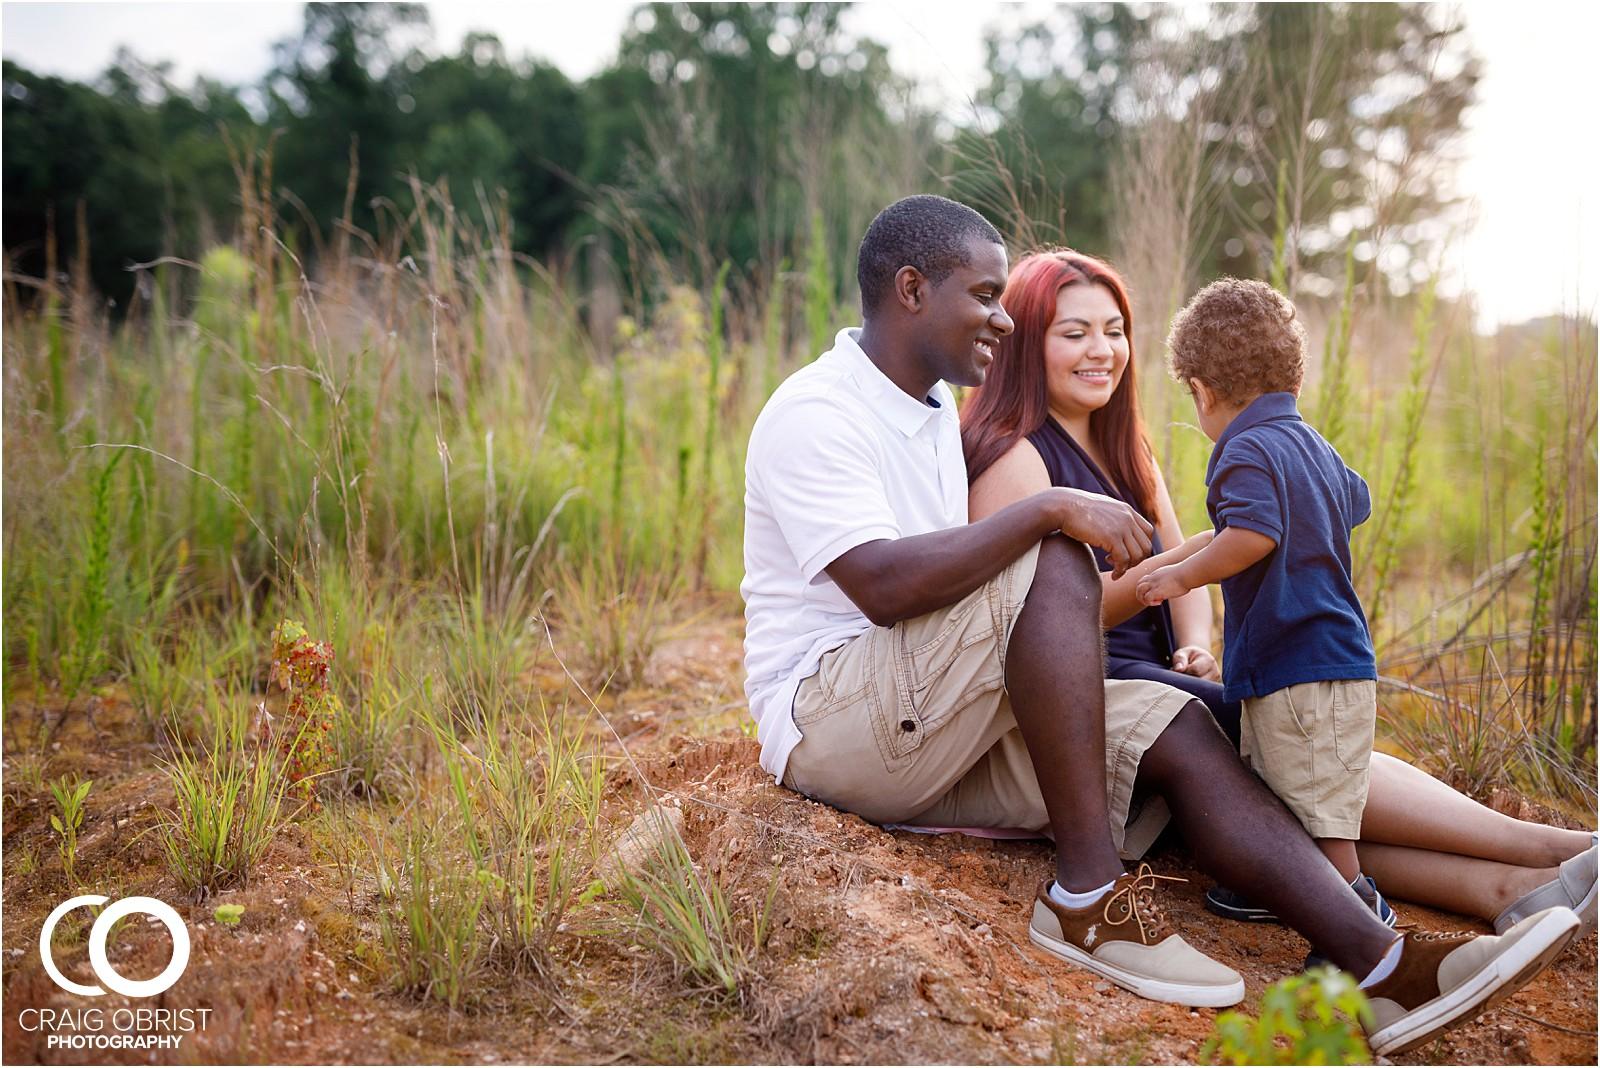 Grass Field Family Portratis Sunset Atlanta_0022.jpg